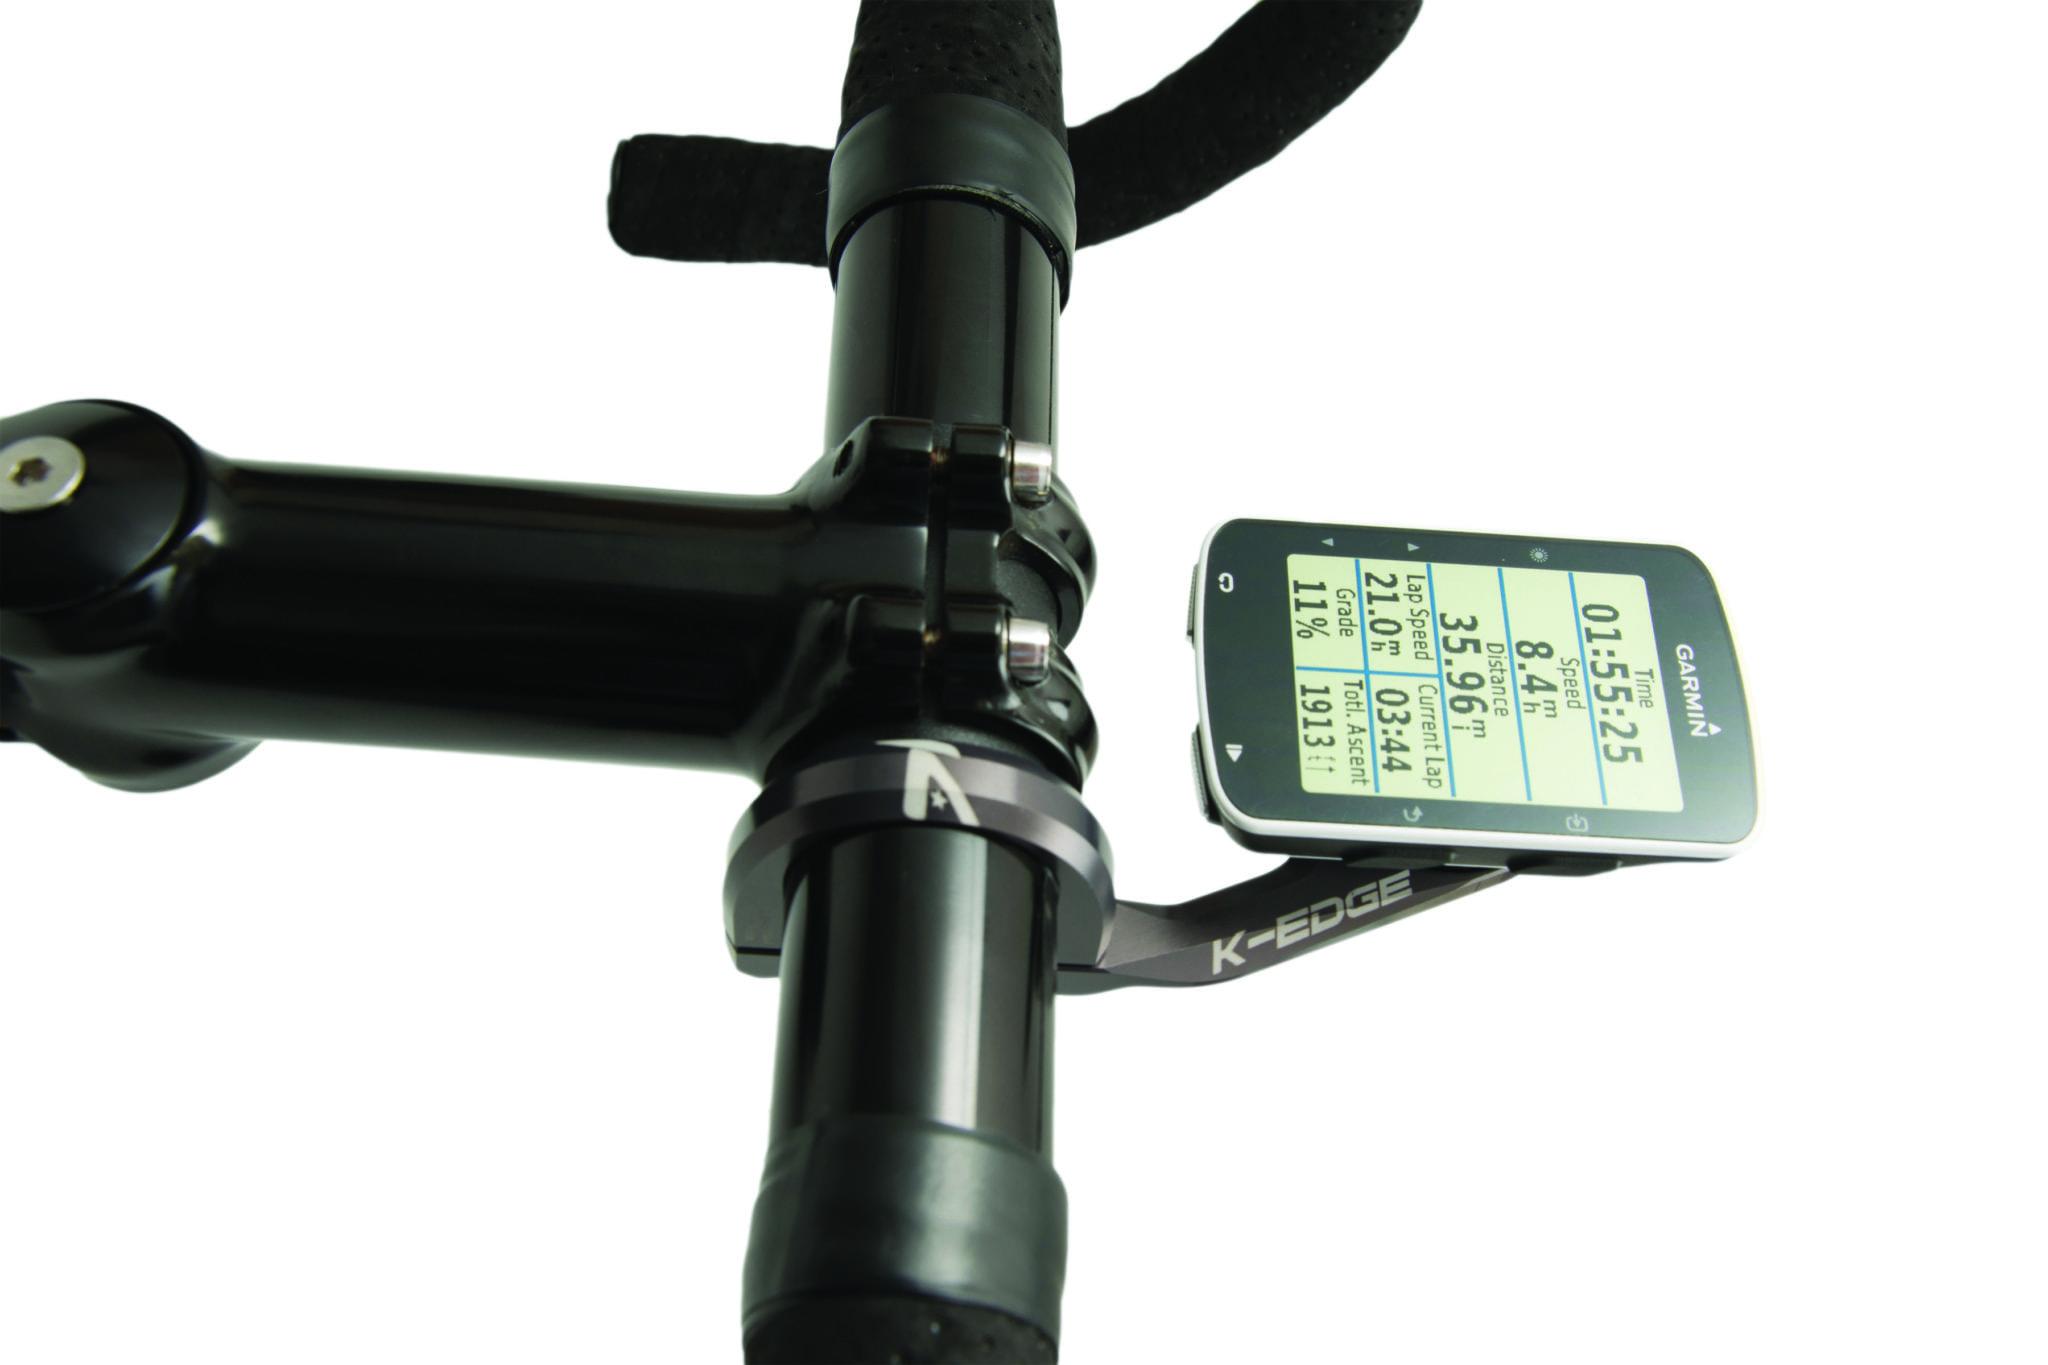 K-EDGE Sport Garmin Mount Black 31.8mm